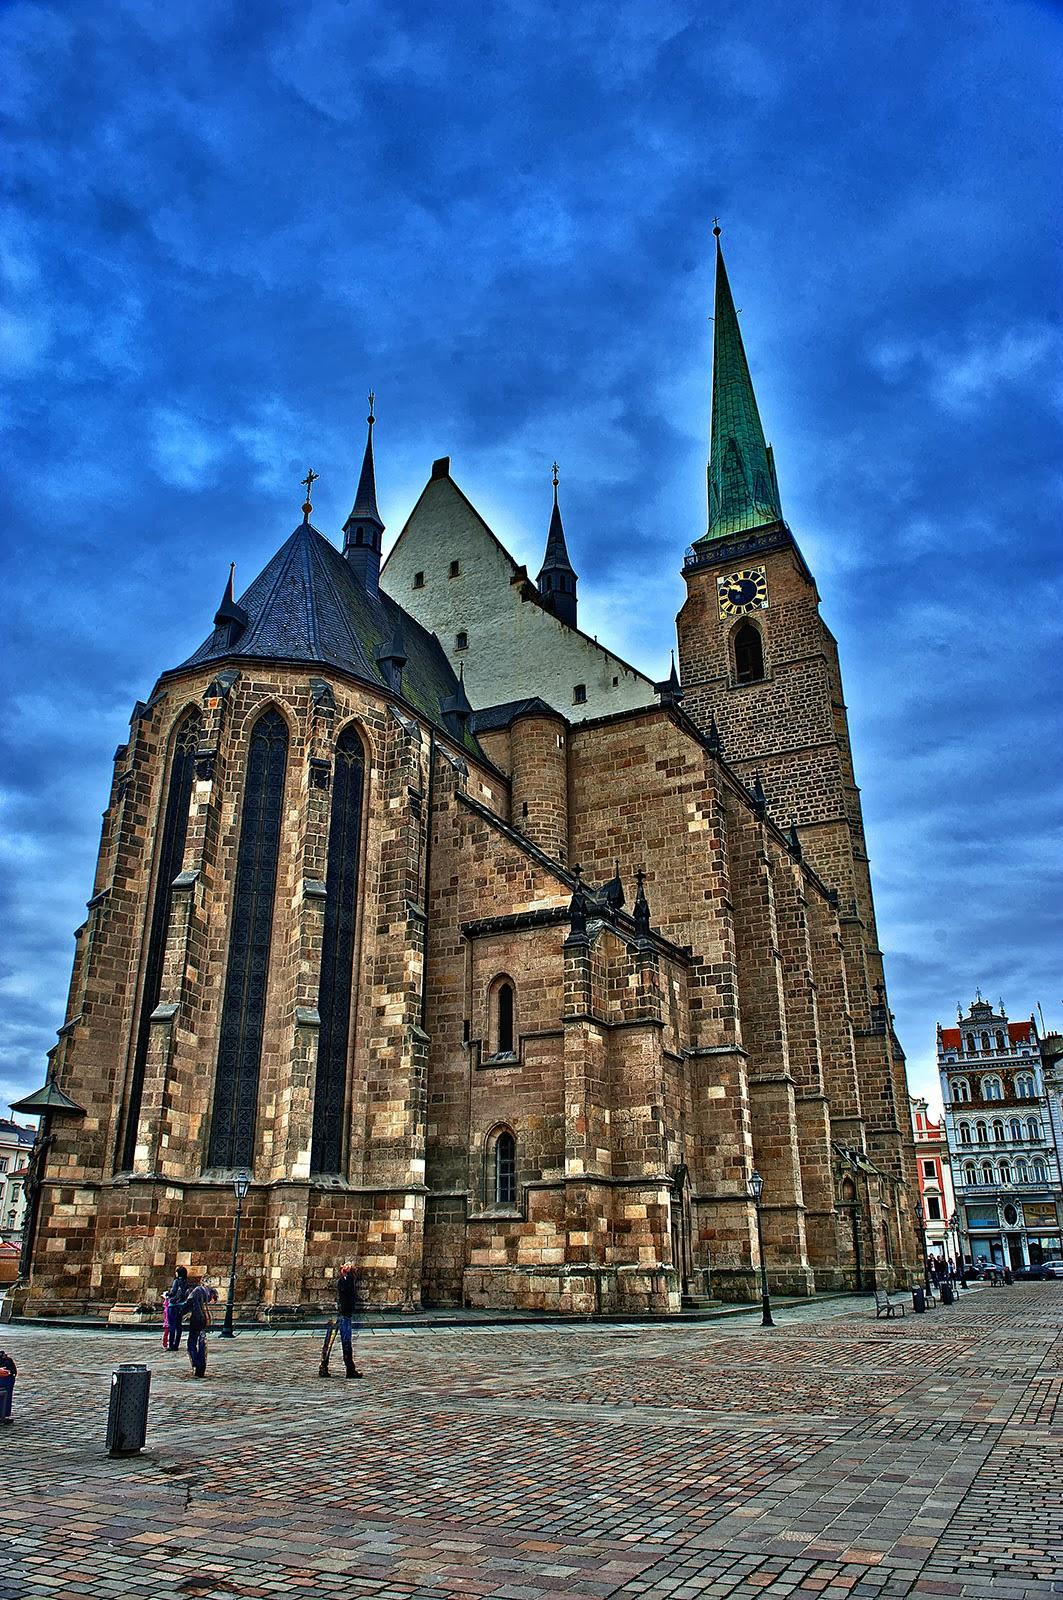 Plzen, Pilsen, Czech Republic, Plzen Namesti Republiky, St. Bartholomew's Cathedral Plzen